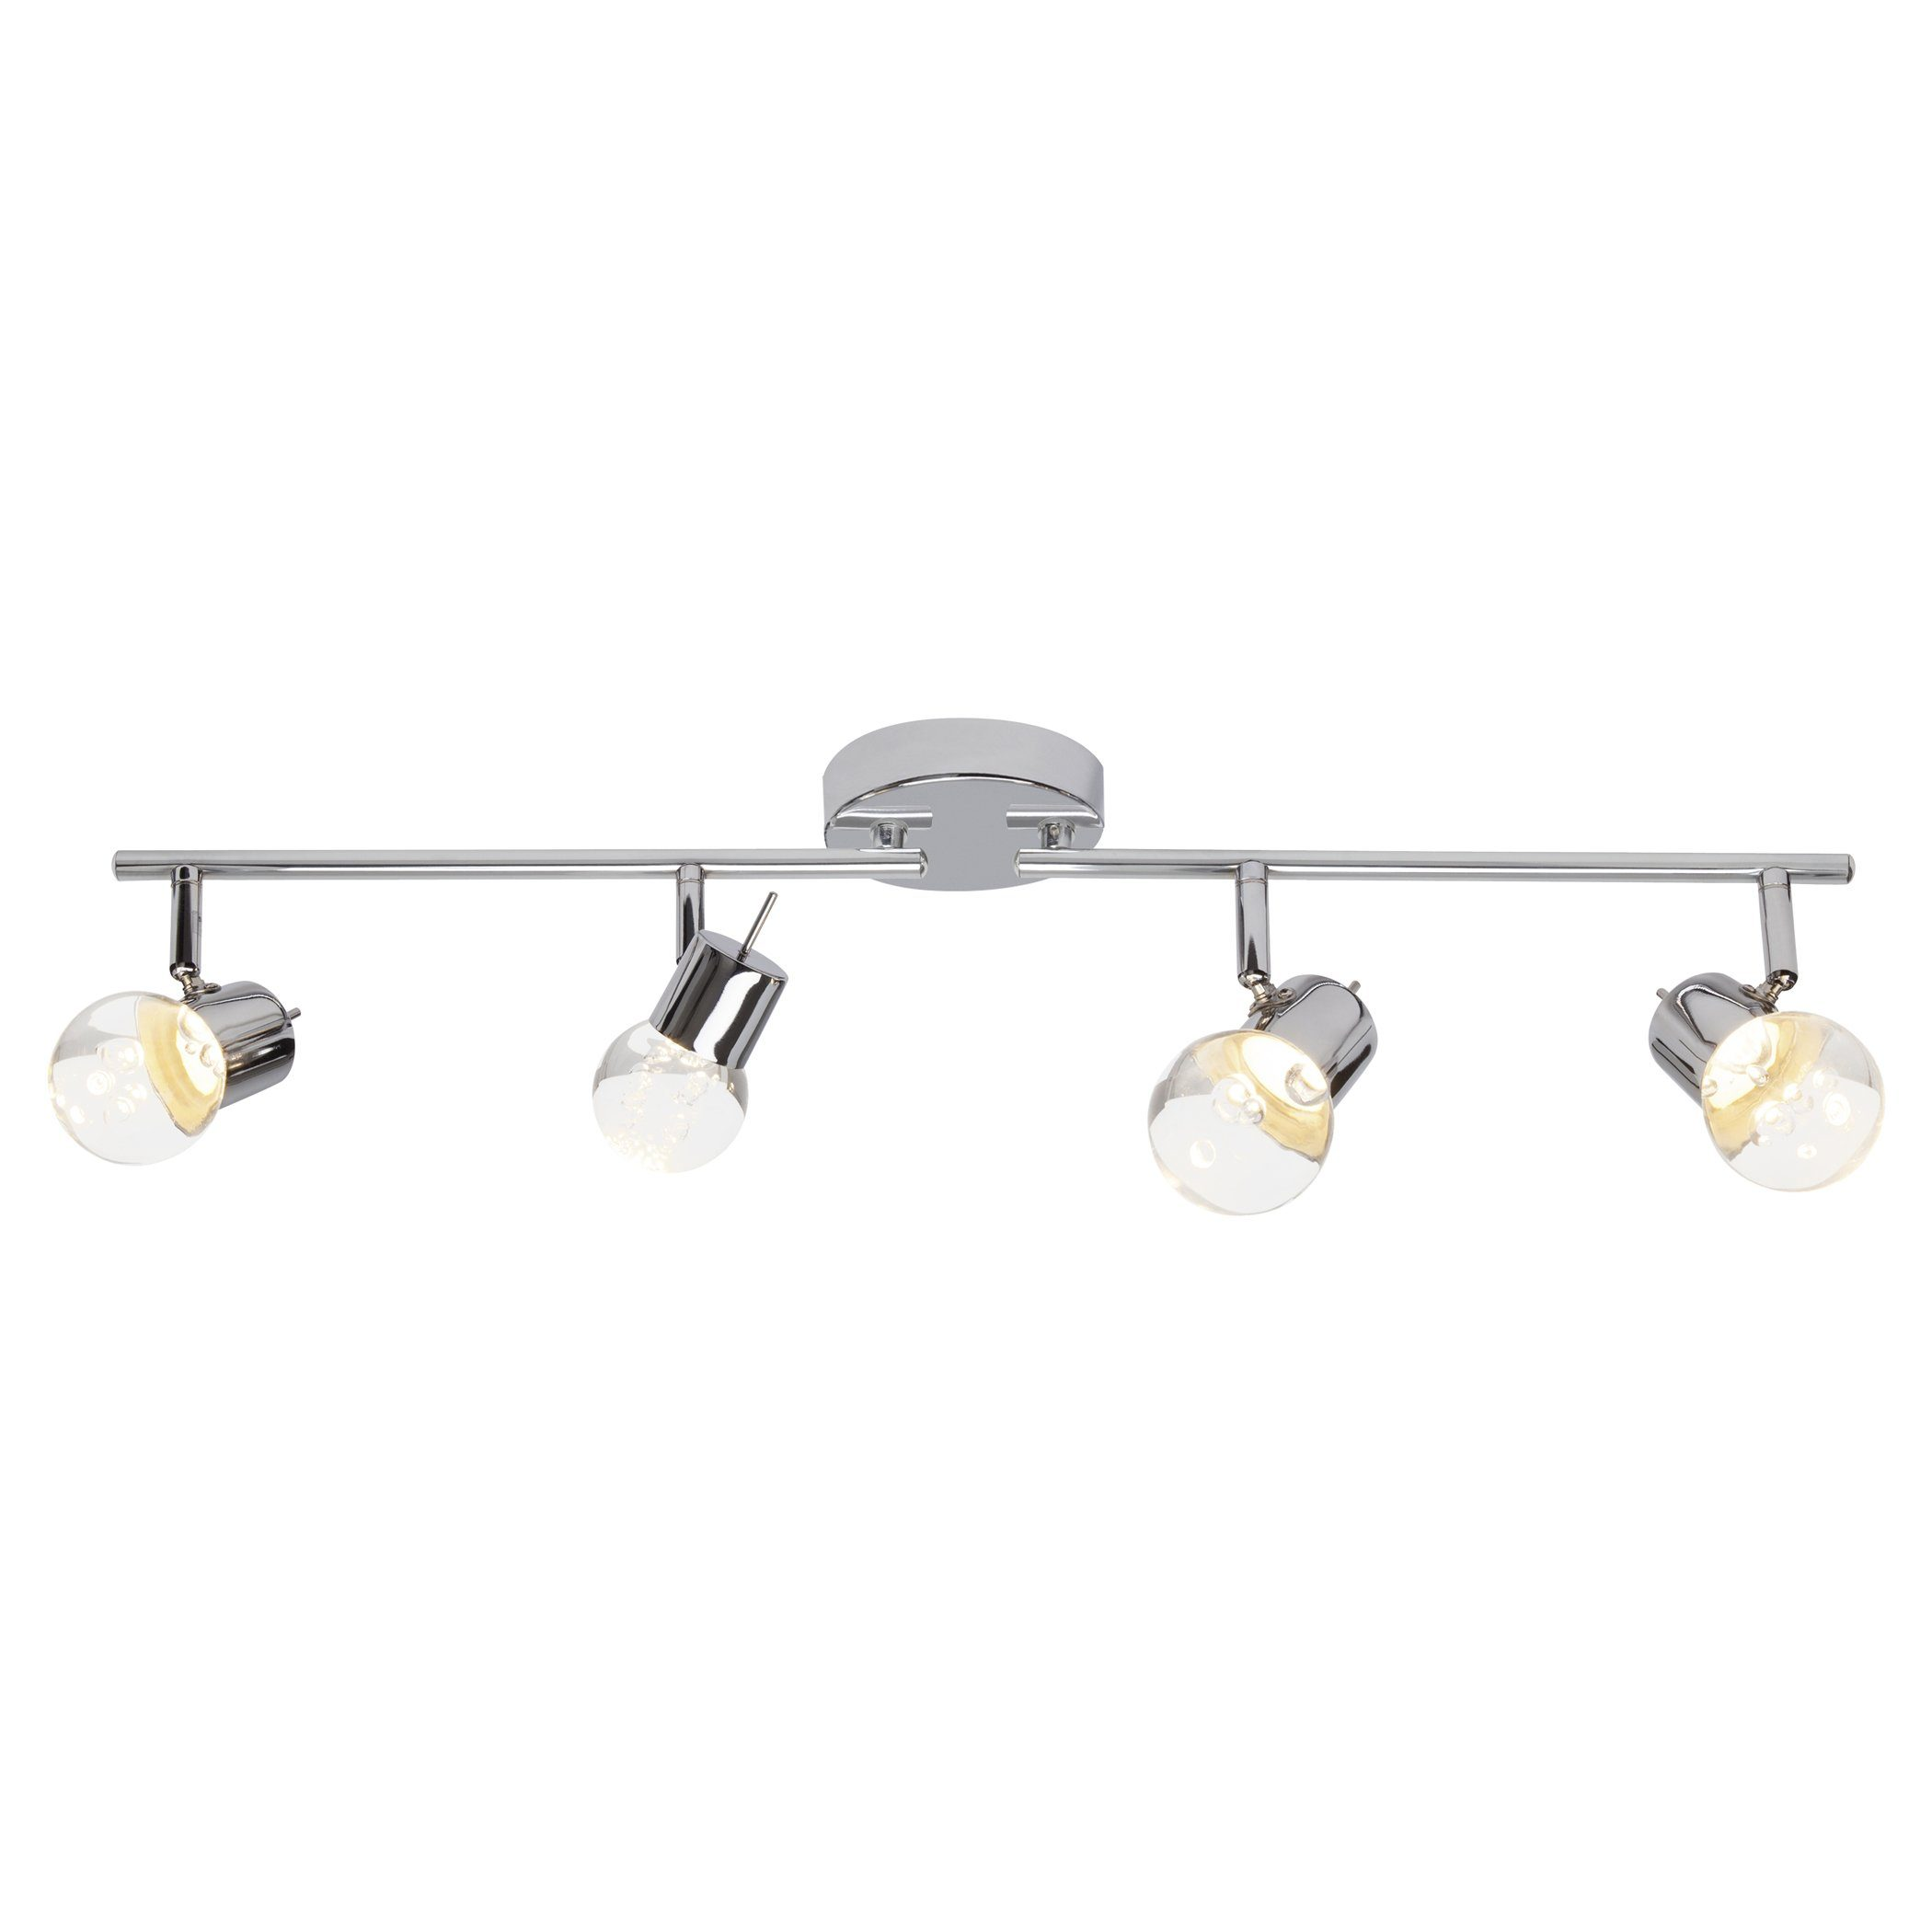 Brilliant Leuchten Lastra LED Spotrohr, 4-flammig chrom